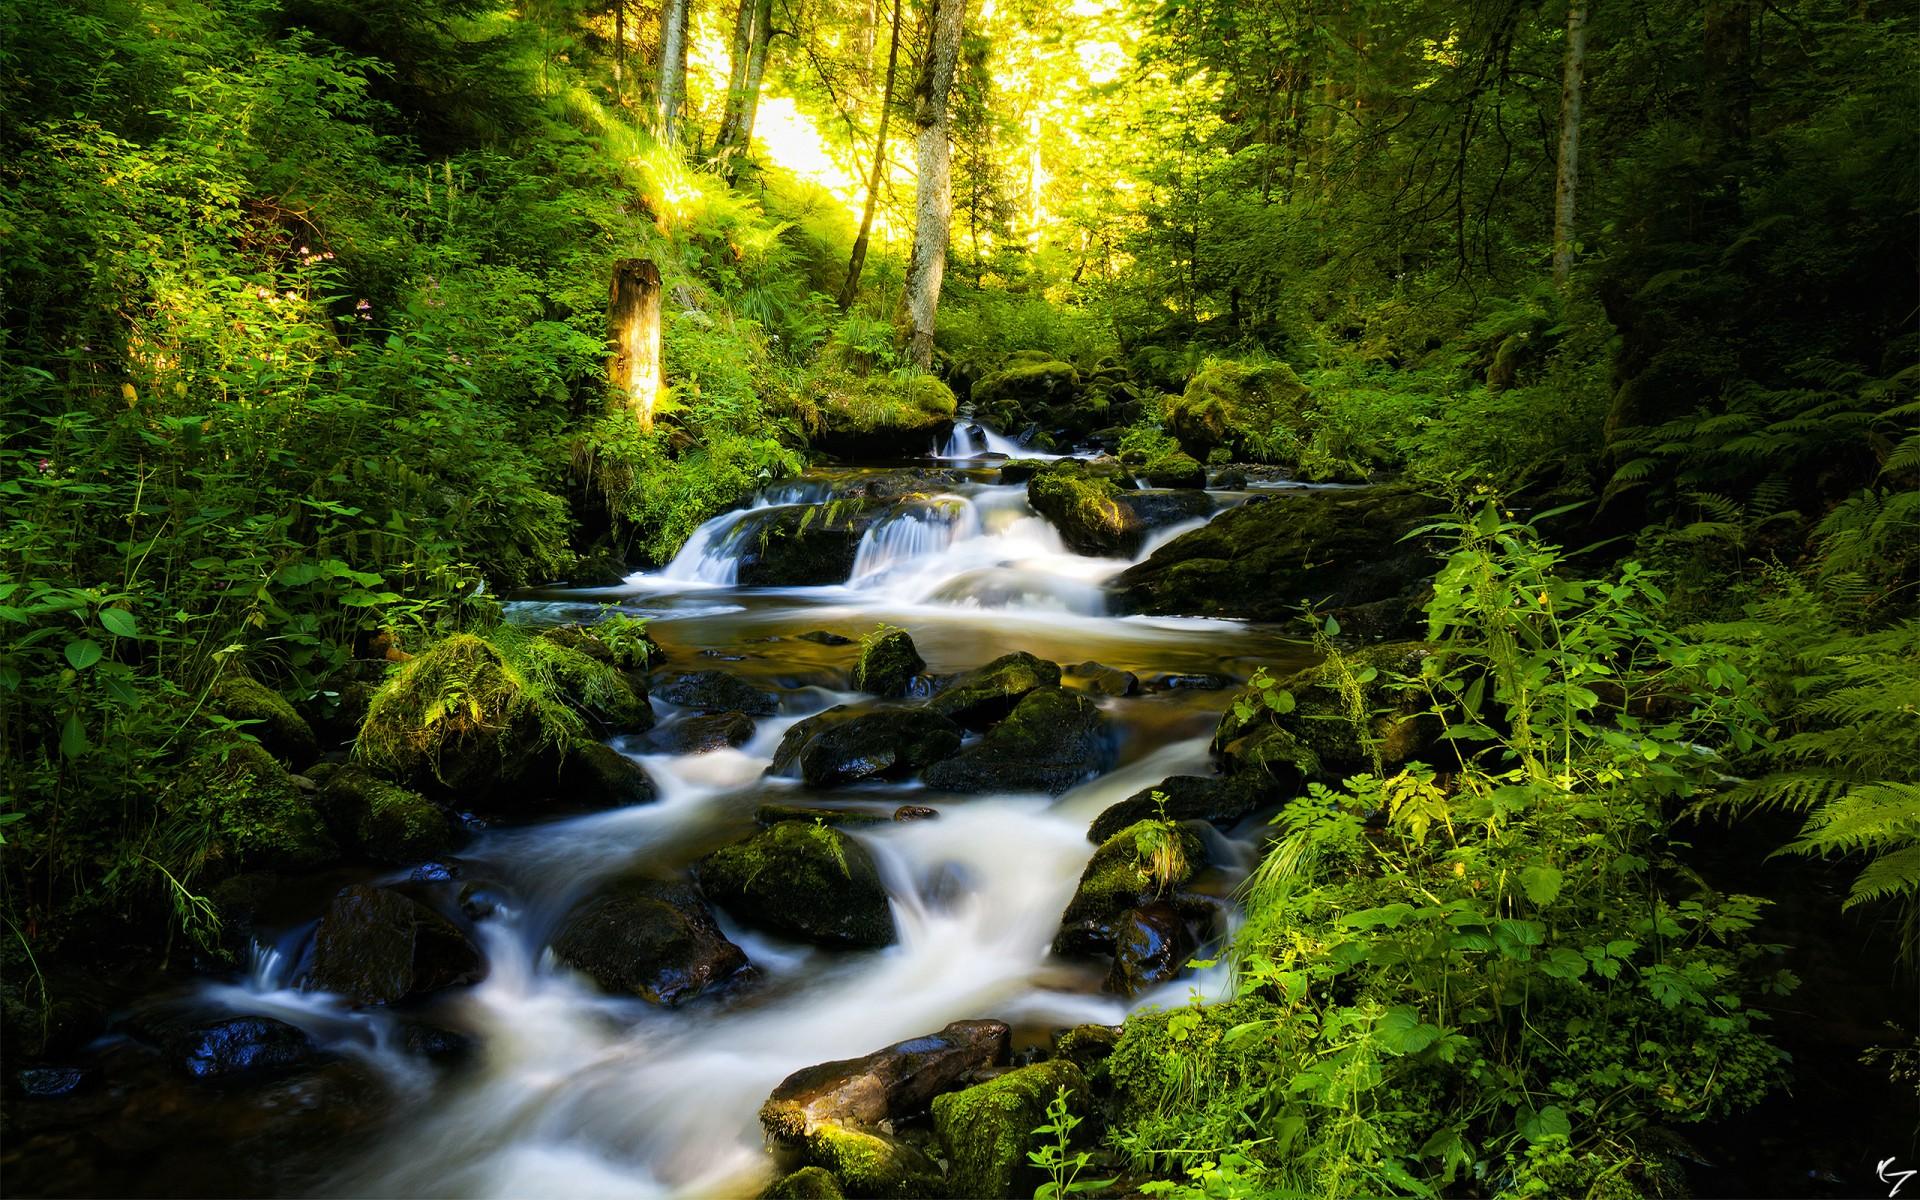 Forest waterfall rocks trees rivers stream landscape plants wallpaper 1920x1200